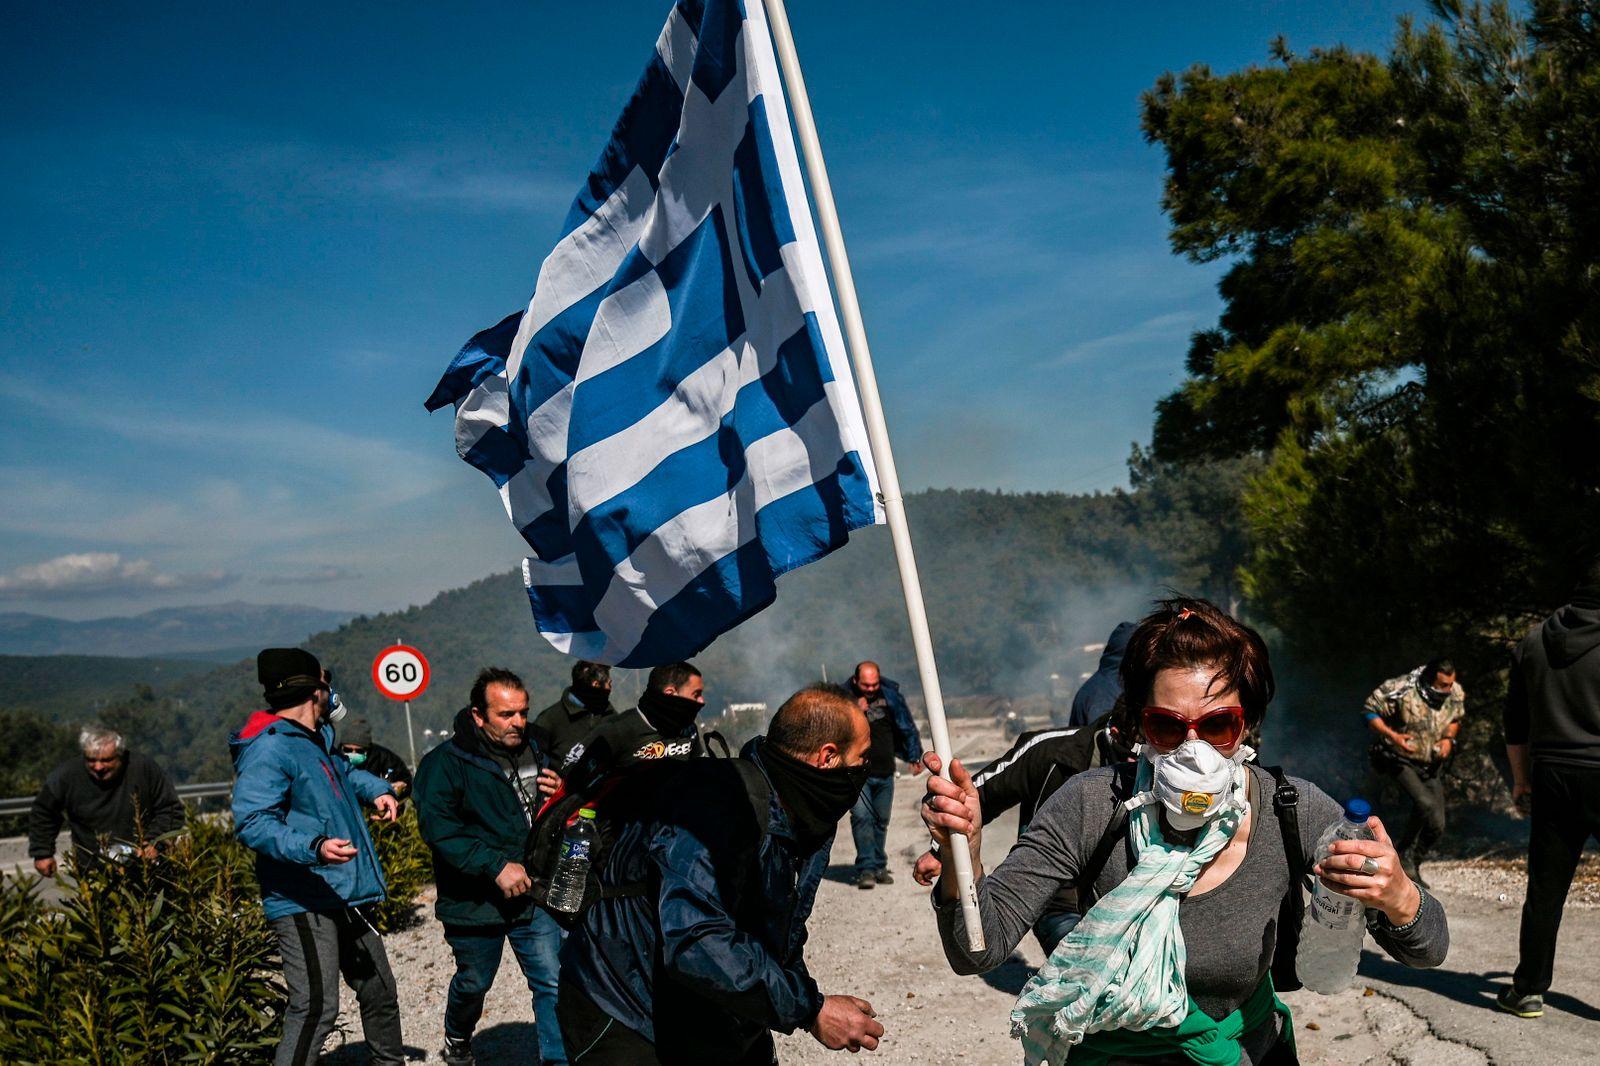 GREECE-UE-MIGRATION-PROTEST